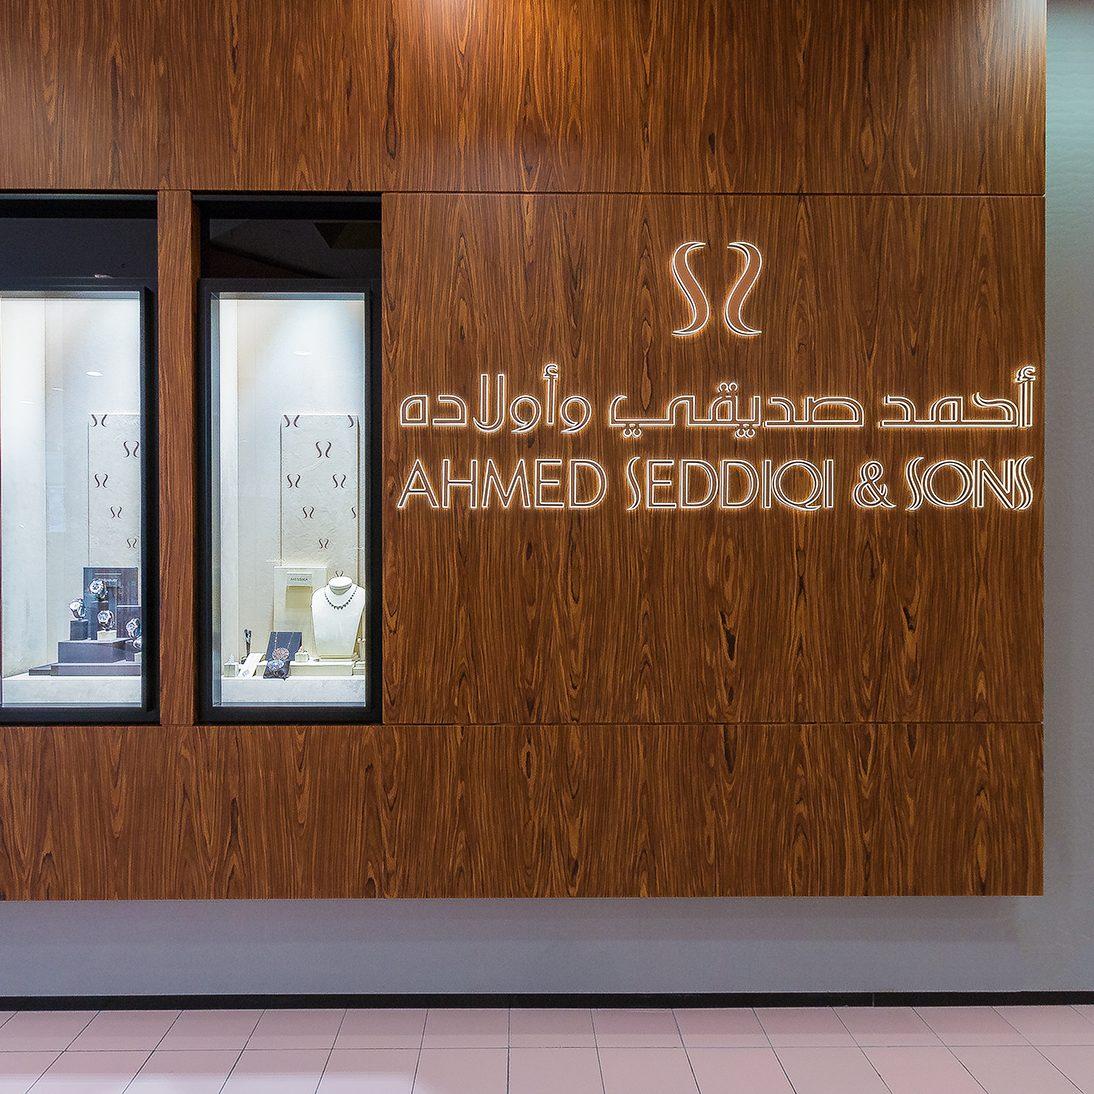 ahmed-seddiqi-sons-front